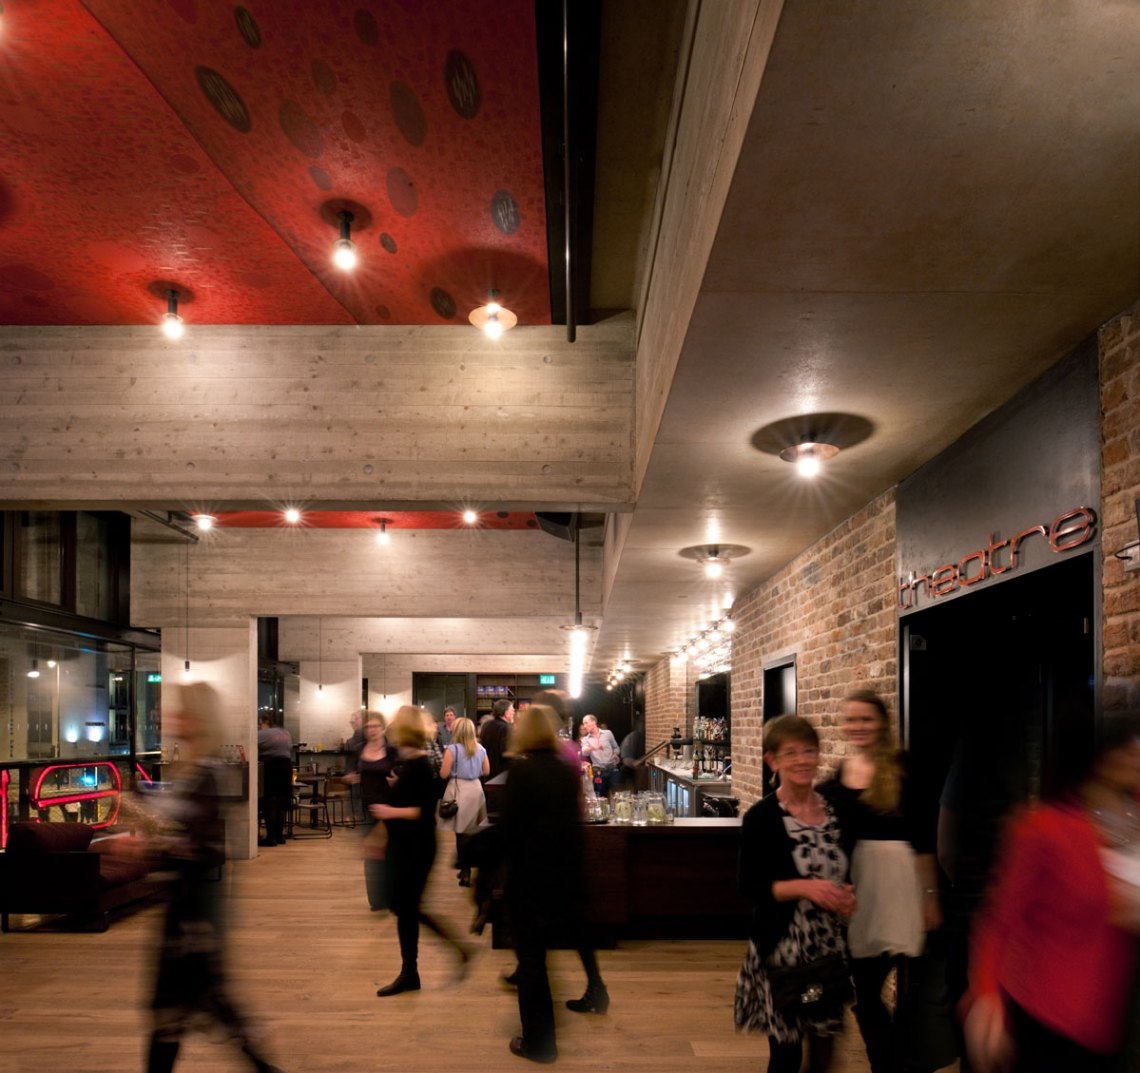 Liverpool Everyman Theatre / Haworth Tompkins Architects